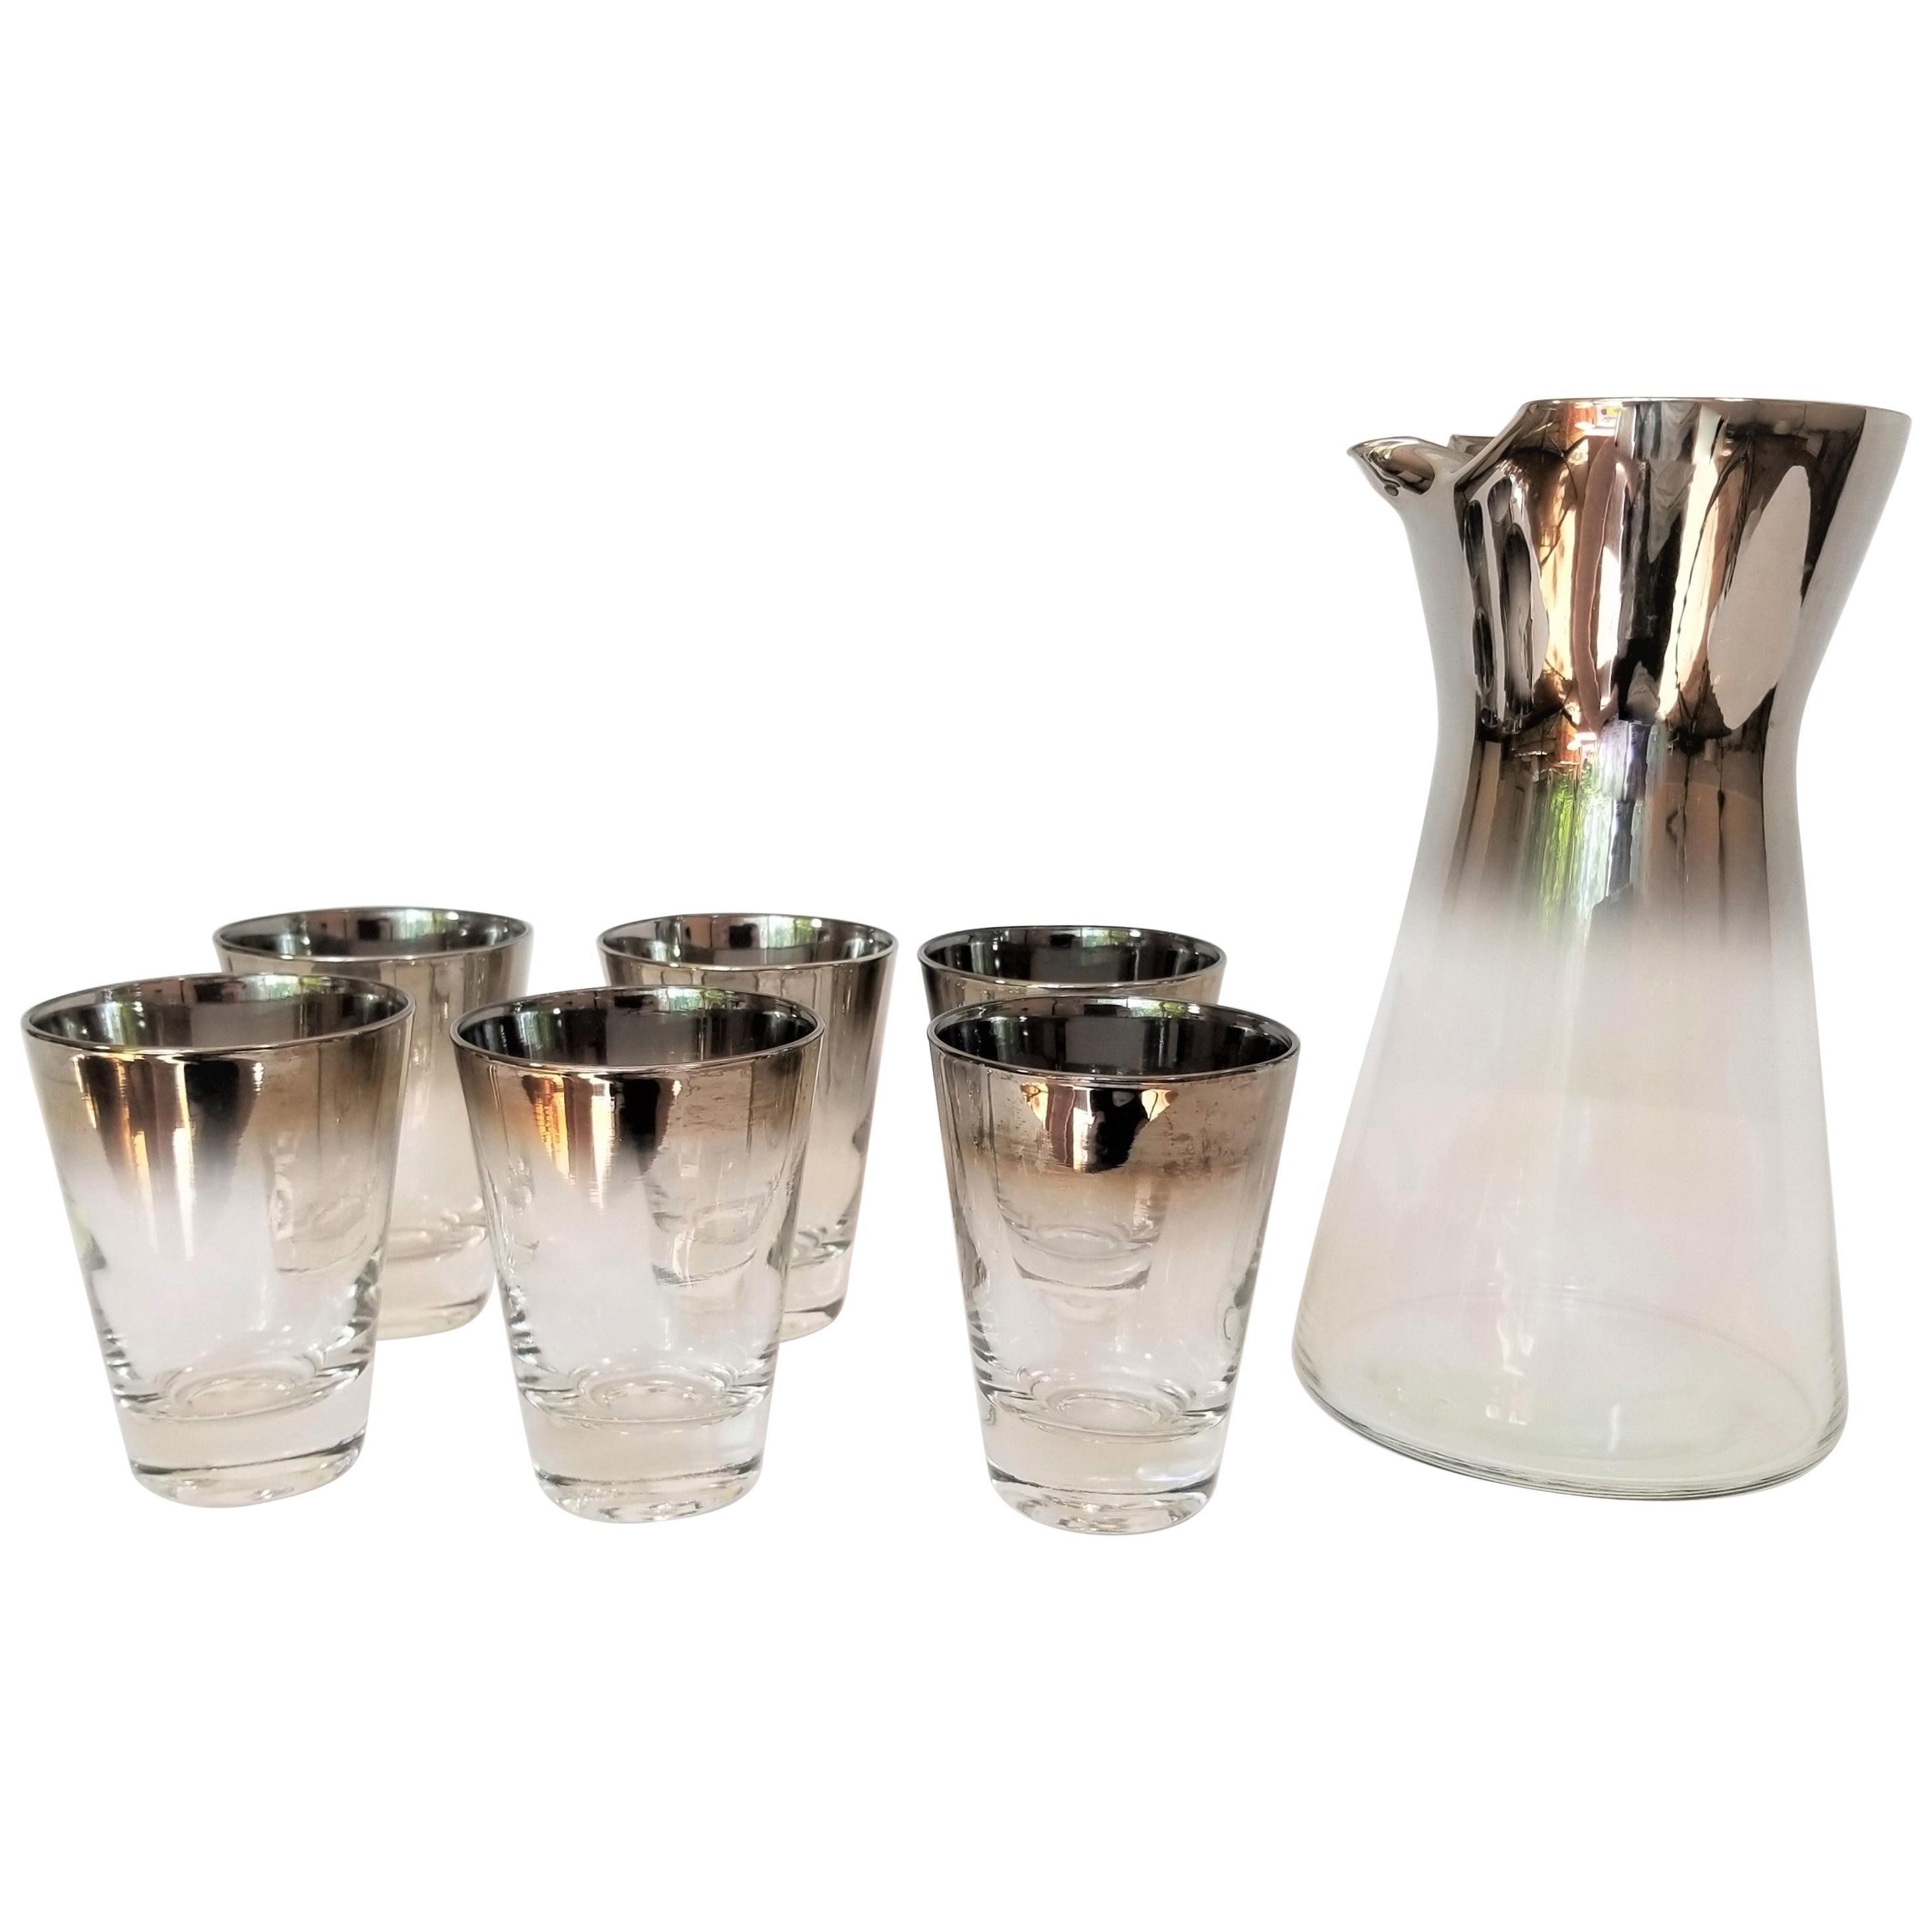 1960s Dorothy Thorpe Midcentury Cocktail Bar Set 7 Pieces